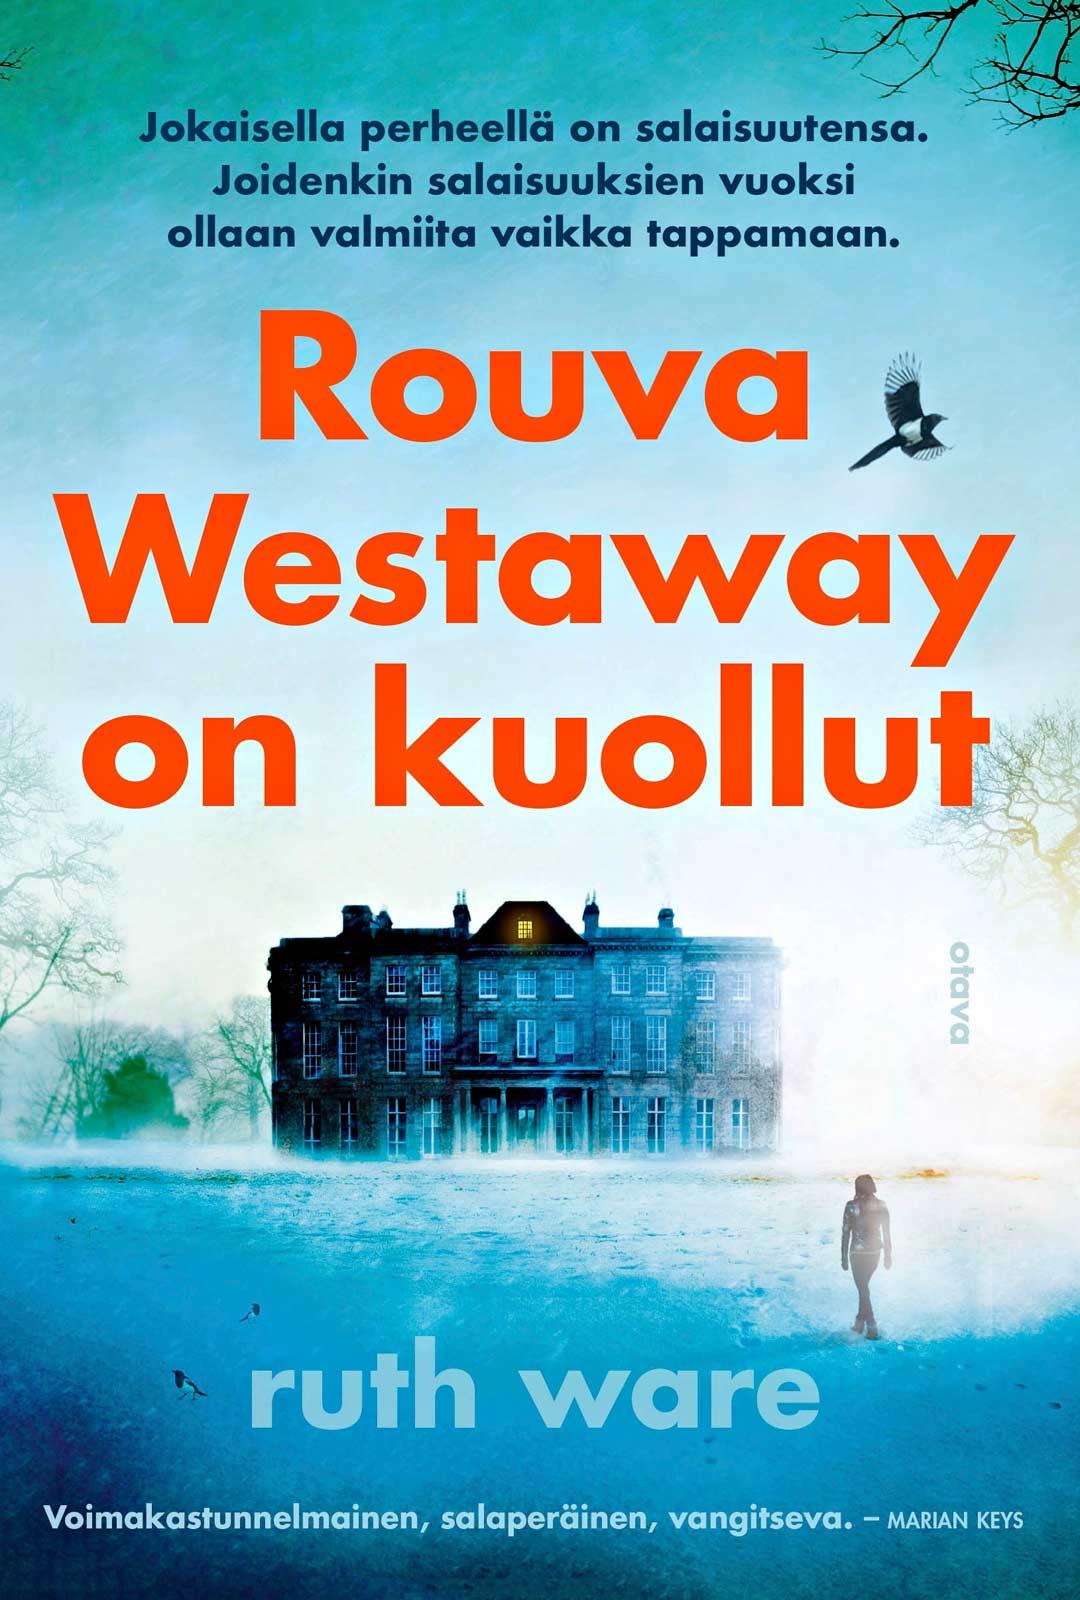 Ruth Ware: Rouva Westaway on kuollut